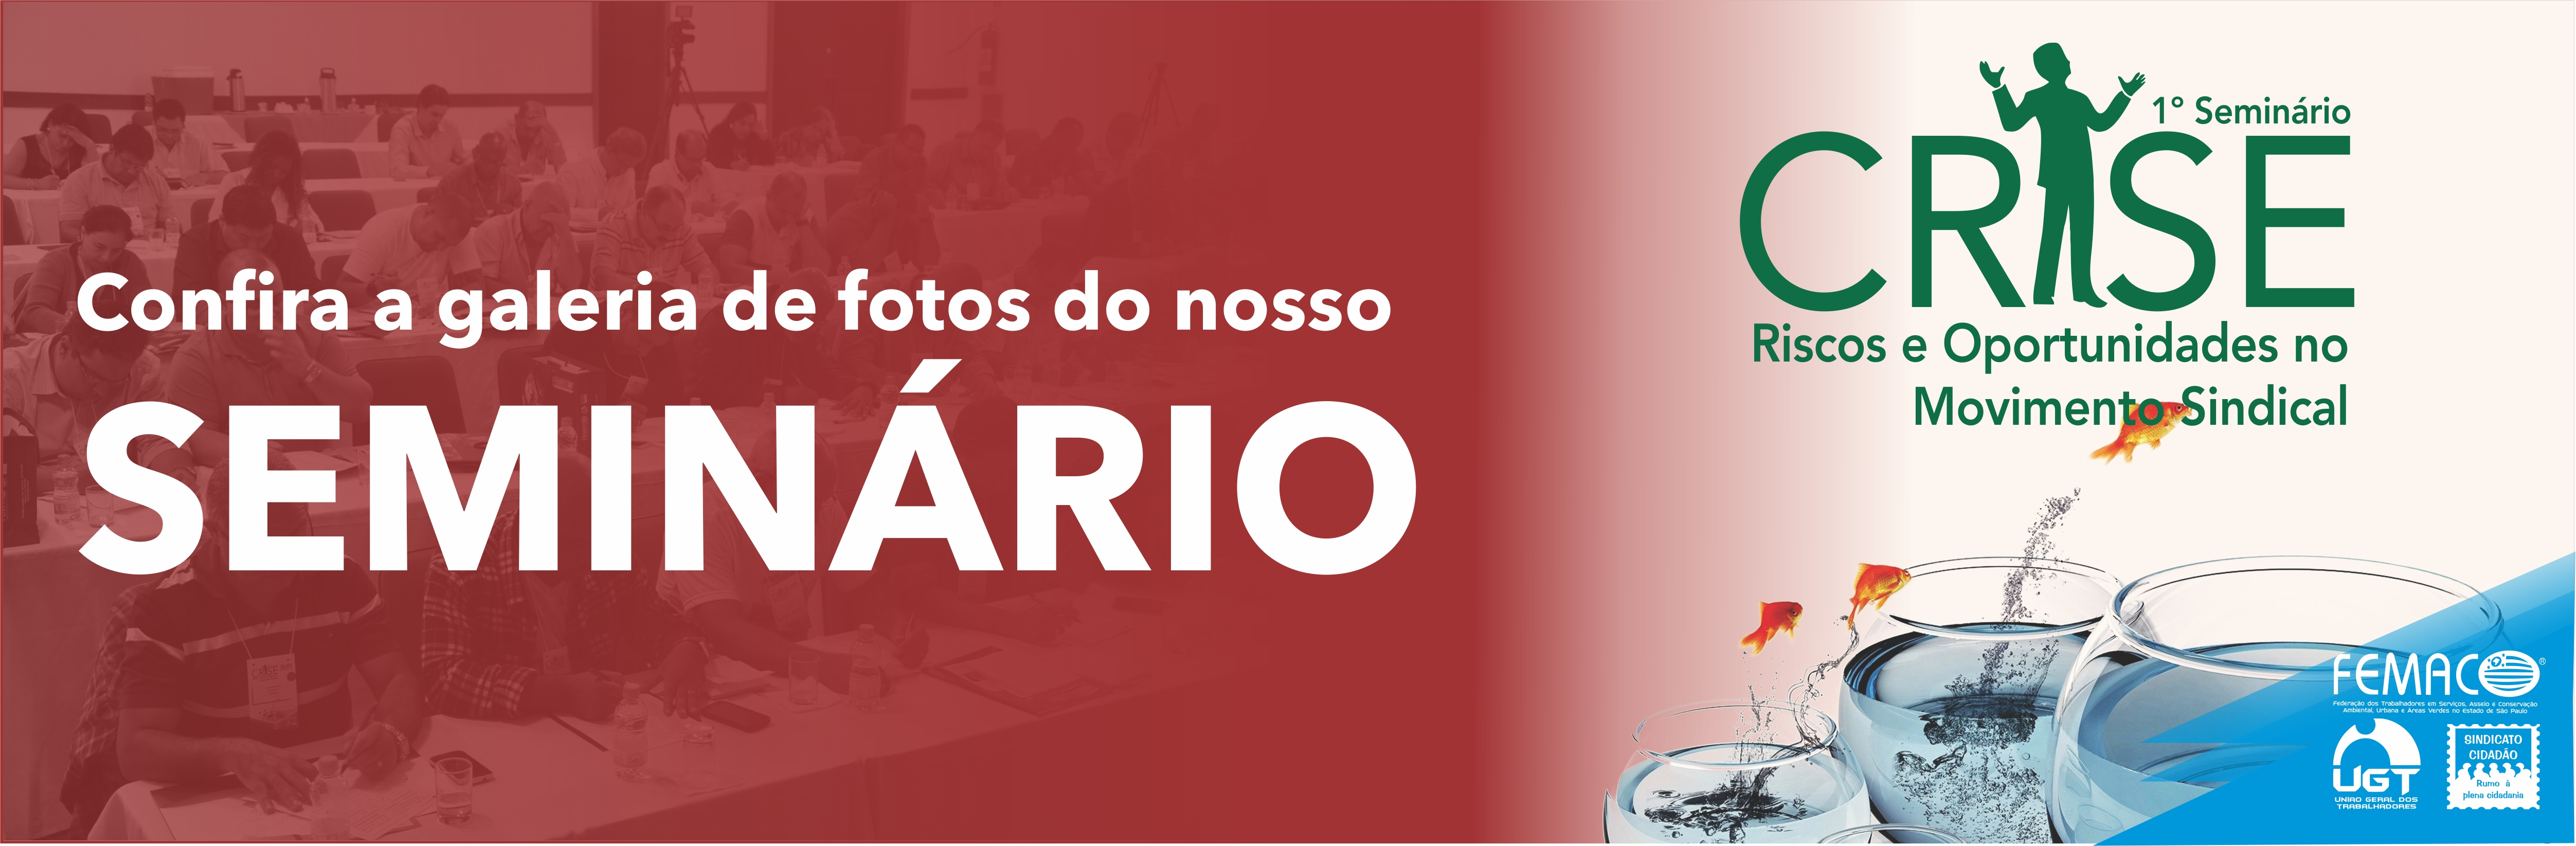 Banner Seminário Crise